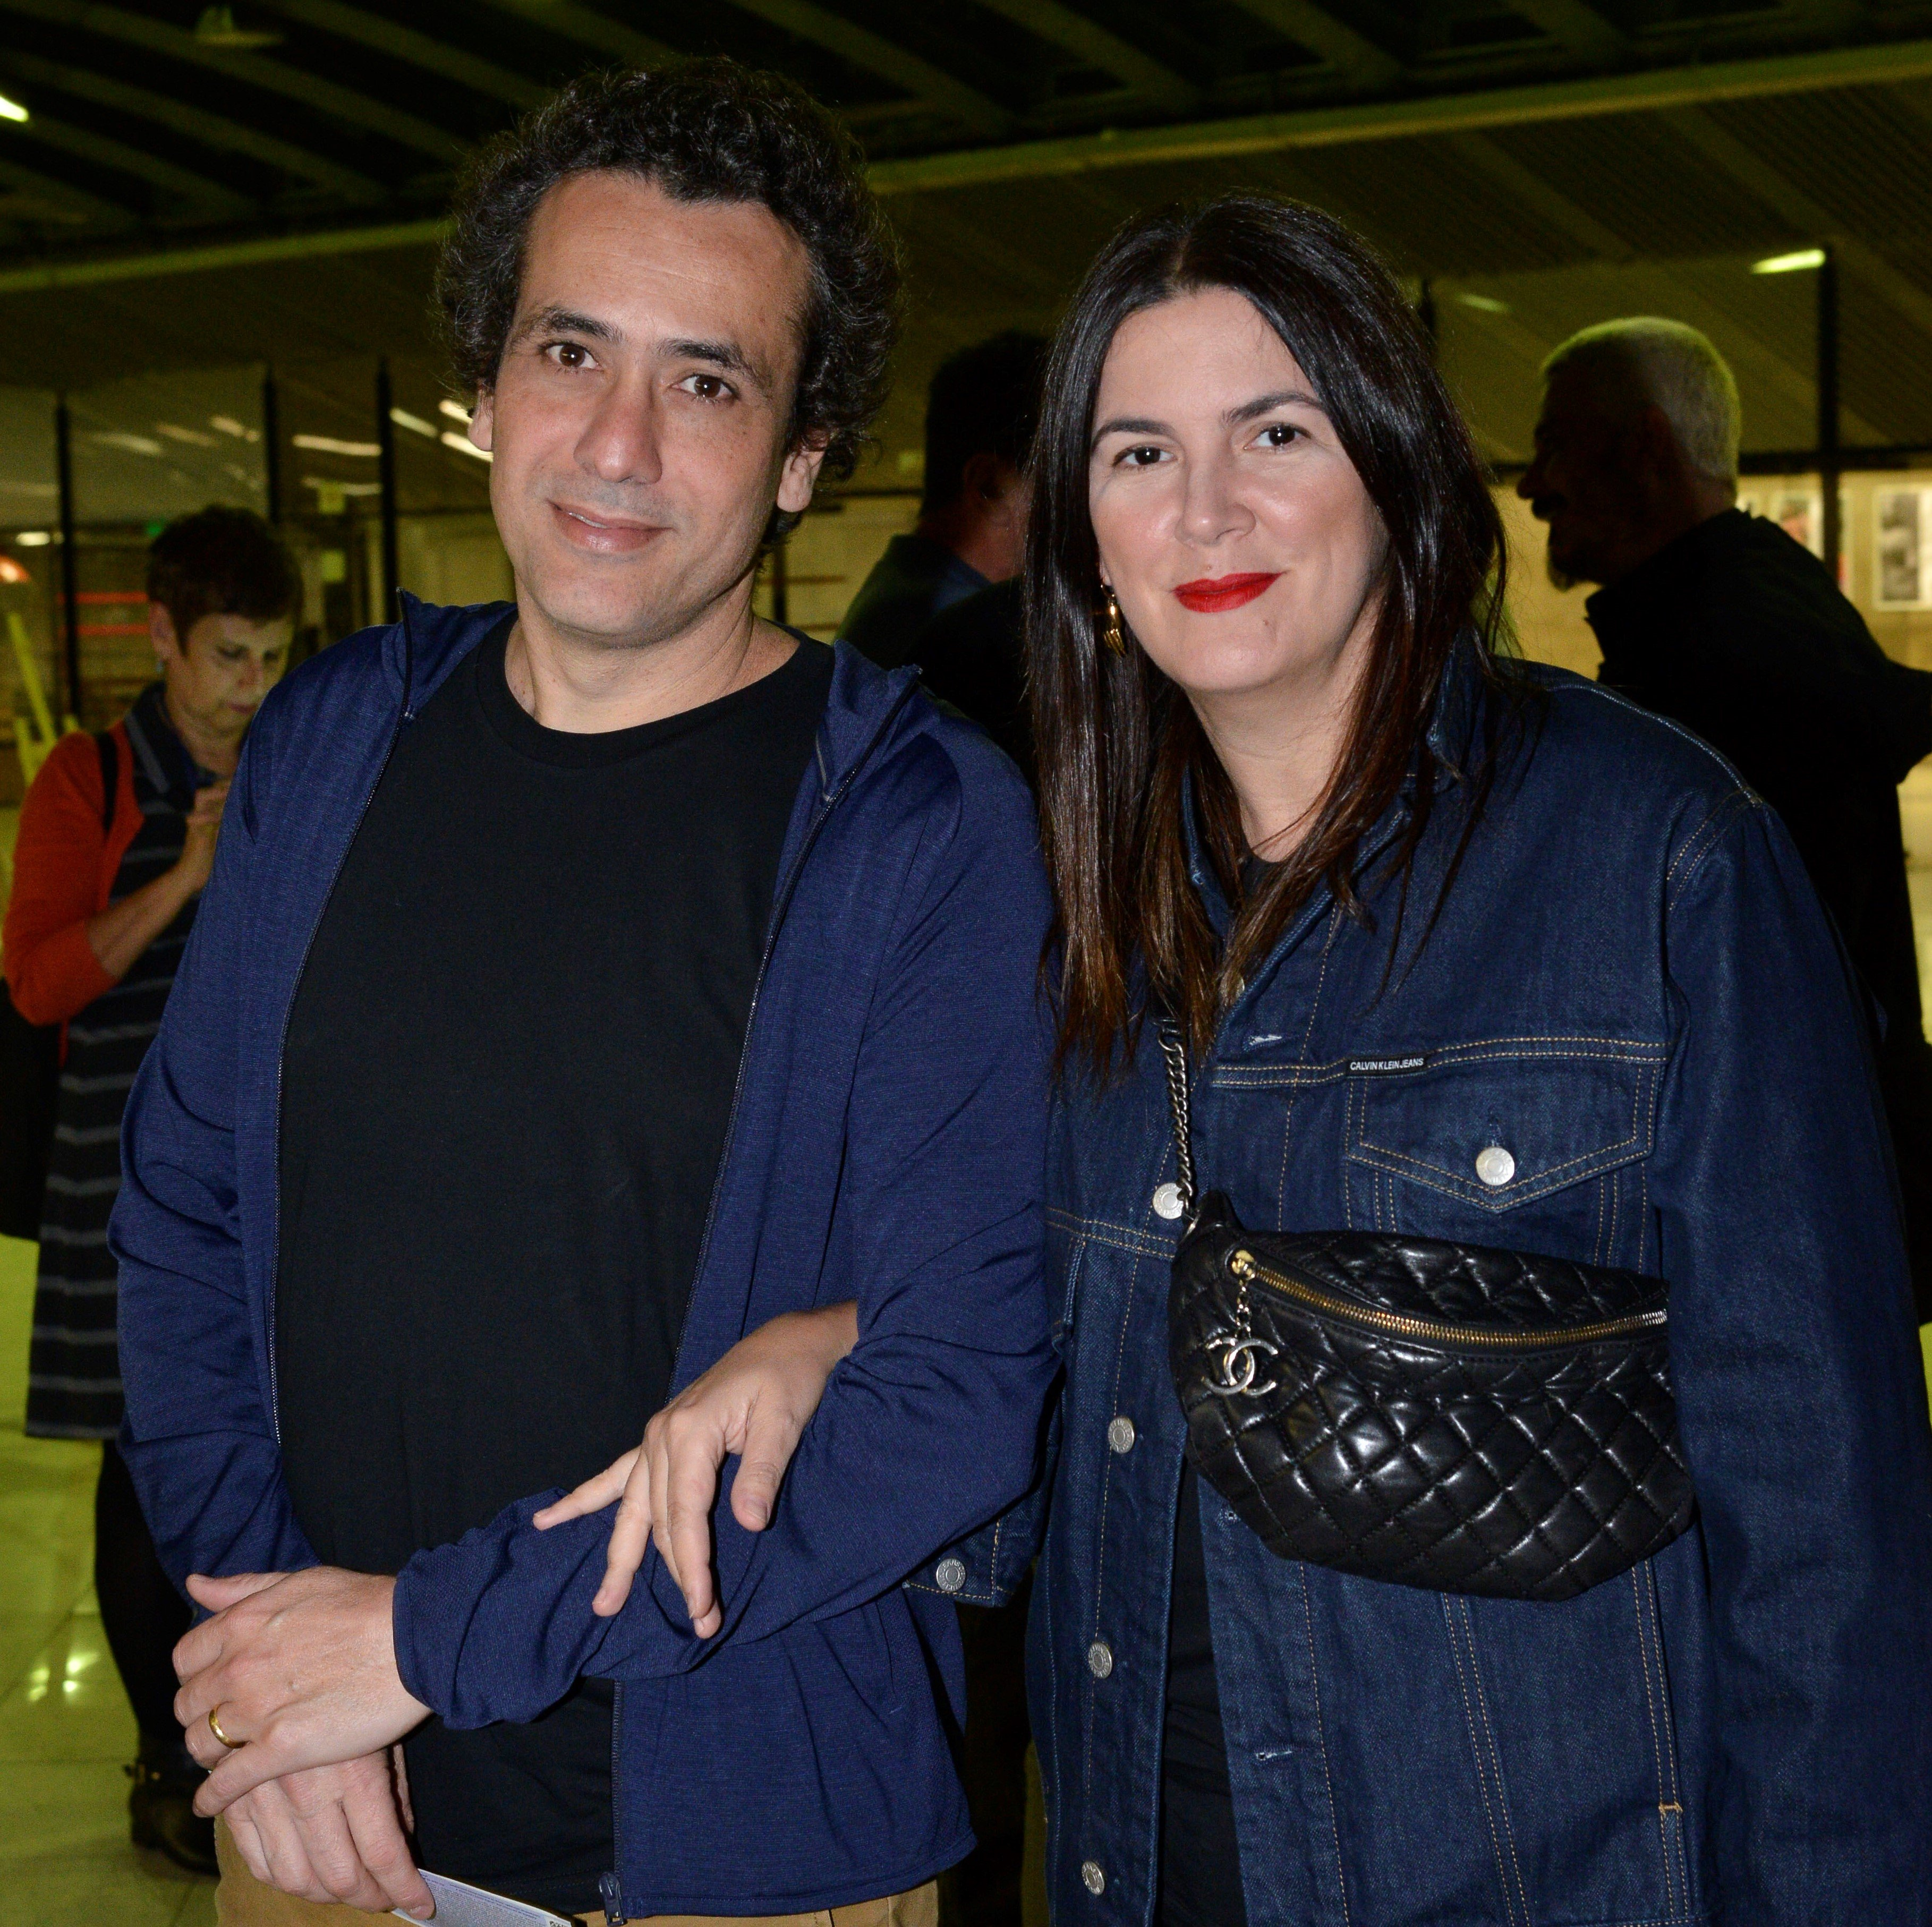 Amilcar Oliveira e Suzana Barbosa  /Fotos: João Sal e Caio Galucci